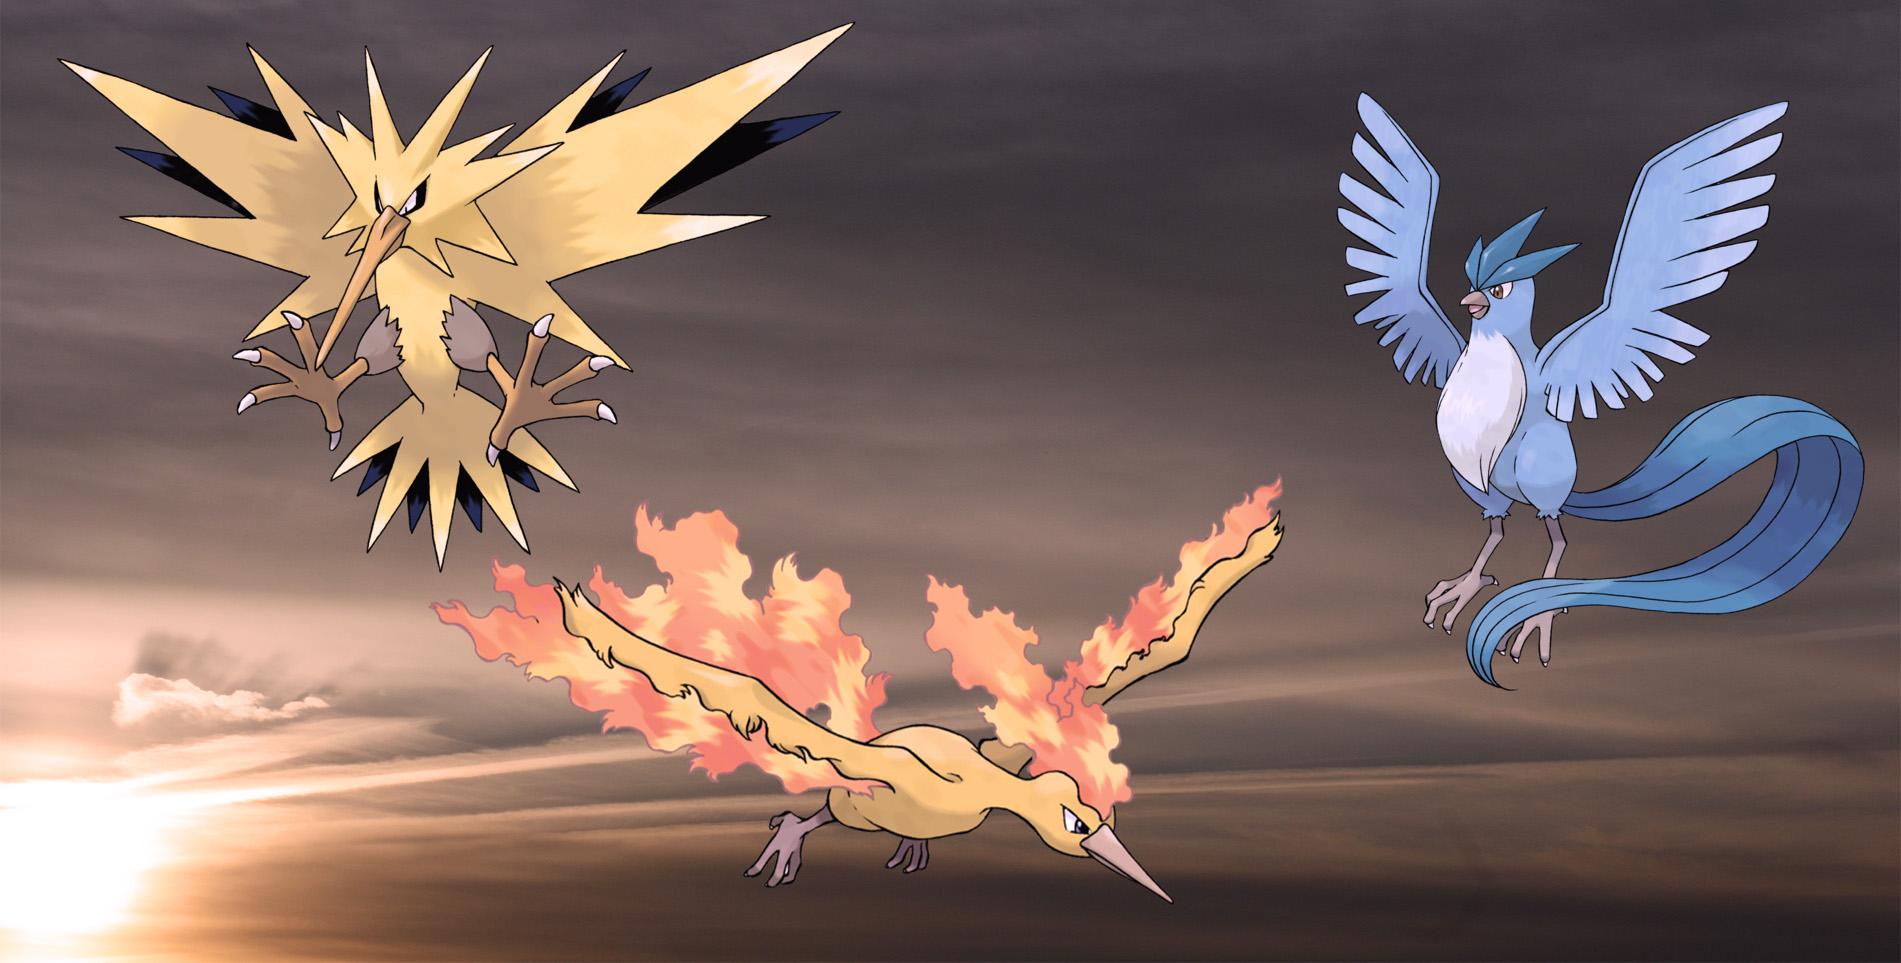 Pokémon GO: Weiteres legendäres Pokémon nun im Spiel!